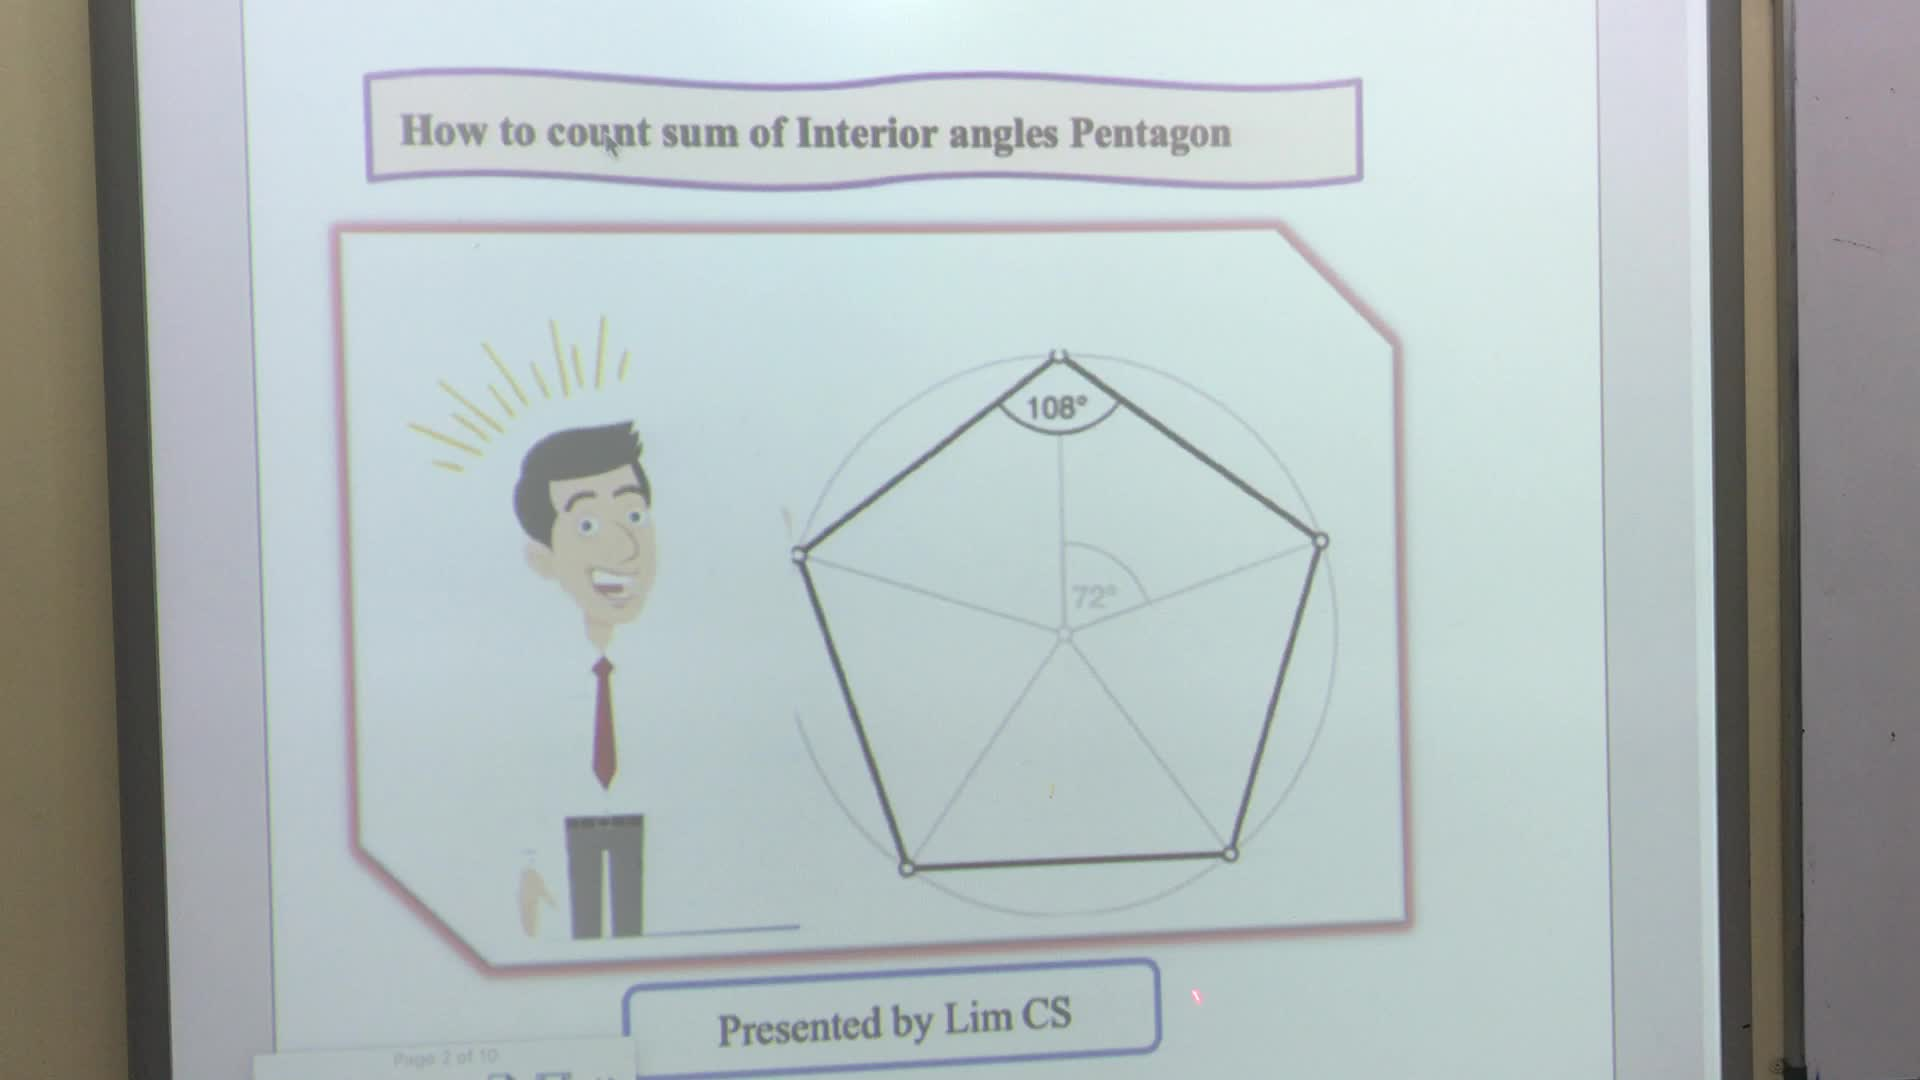 Sum of interior angle Pentagon